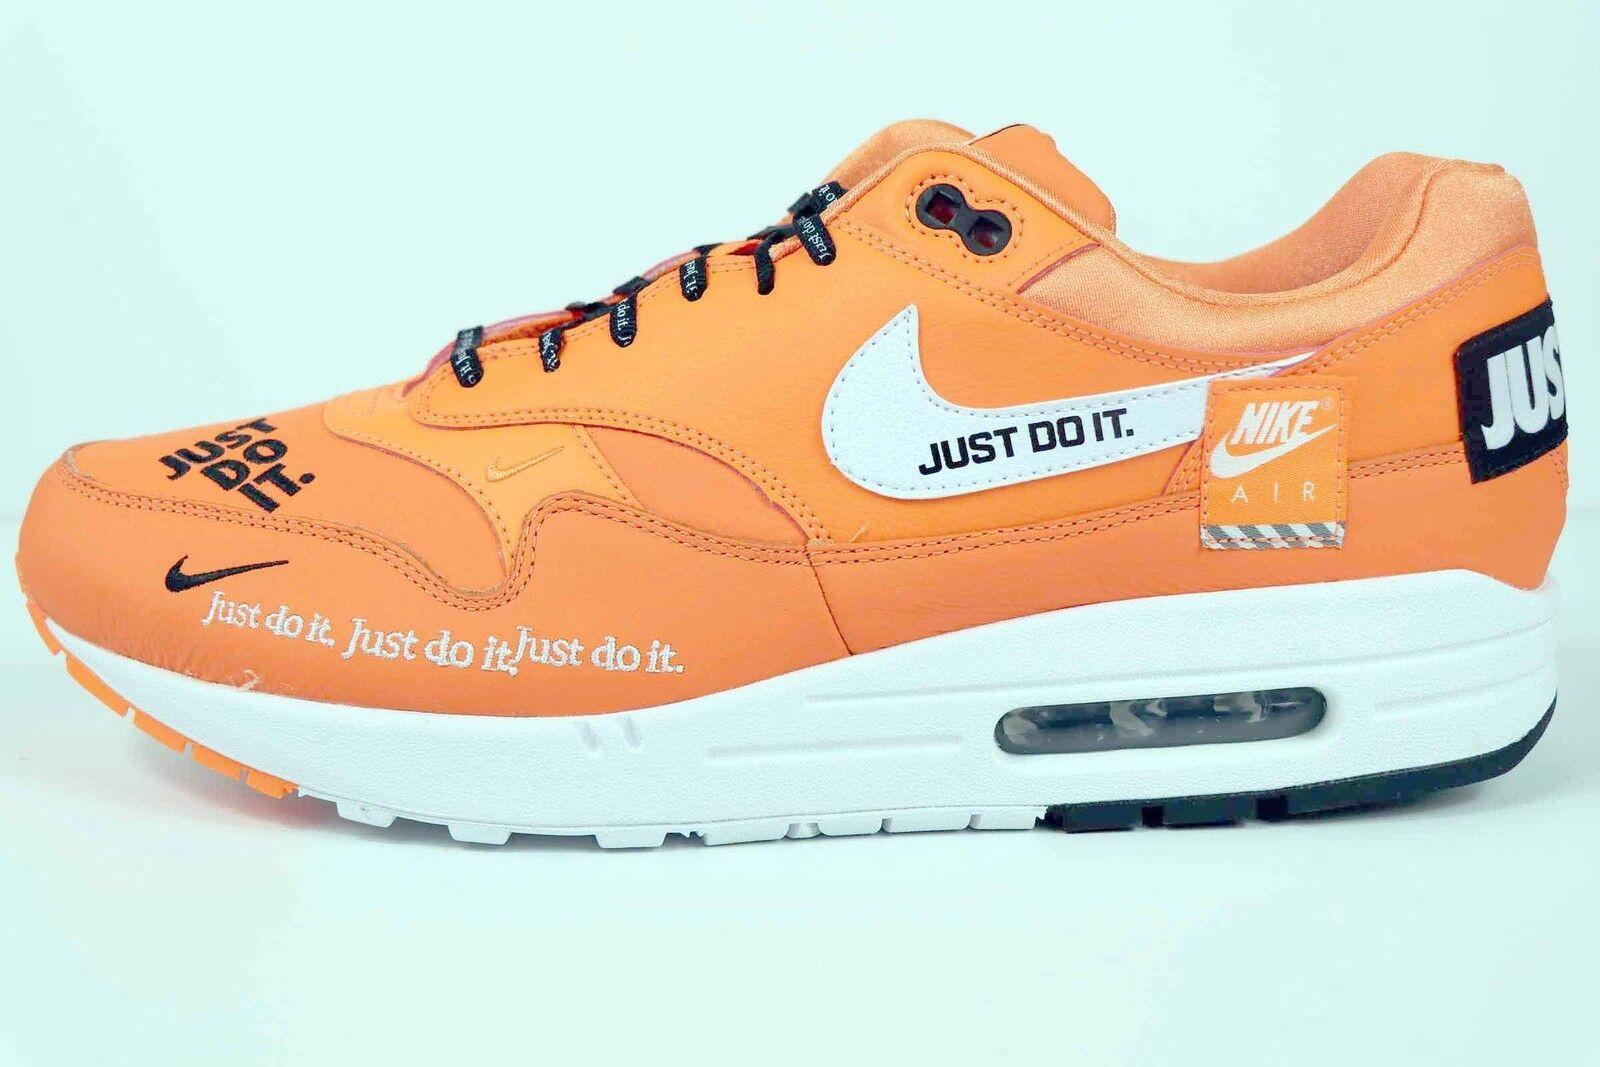 Nike Air Max 1 SE JDI Just Do It Total Orange Blanc Noir AO1021 800